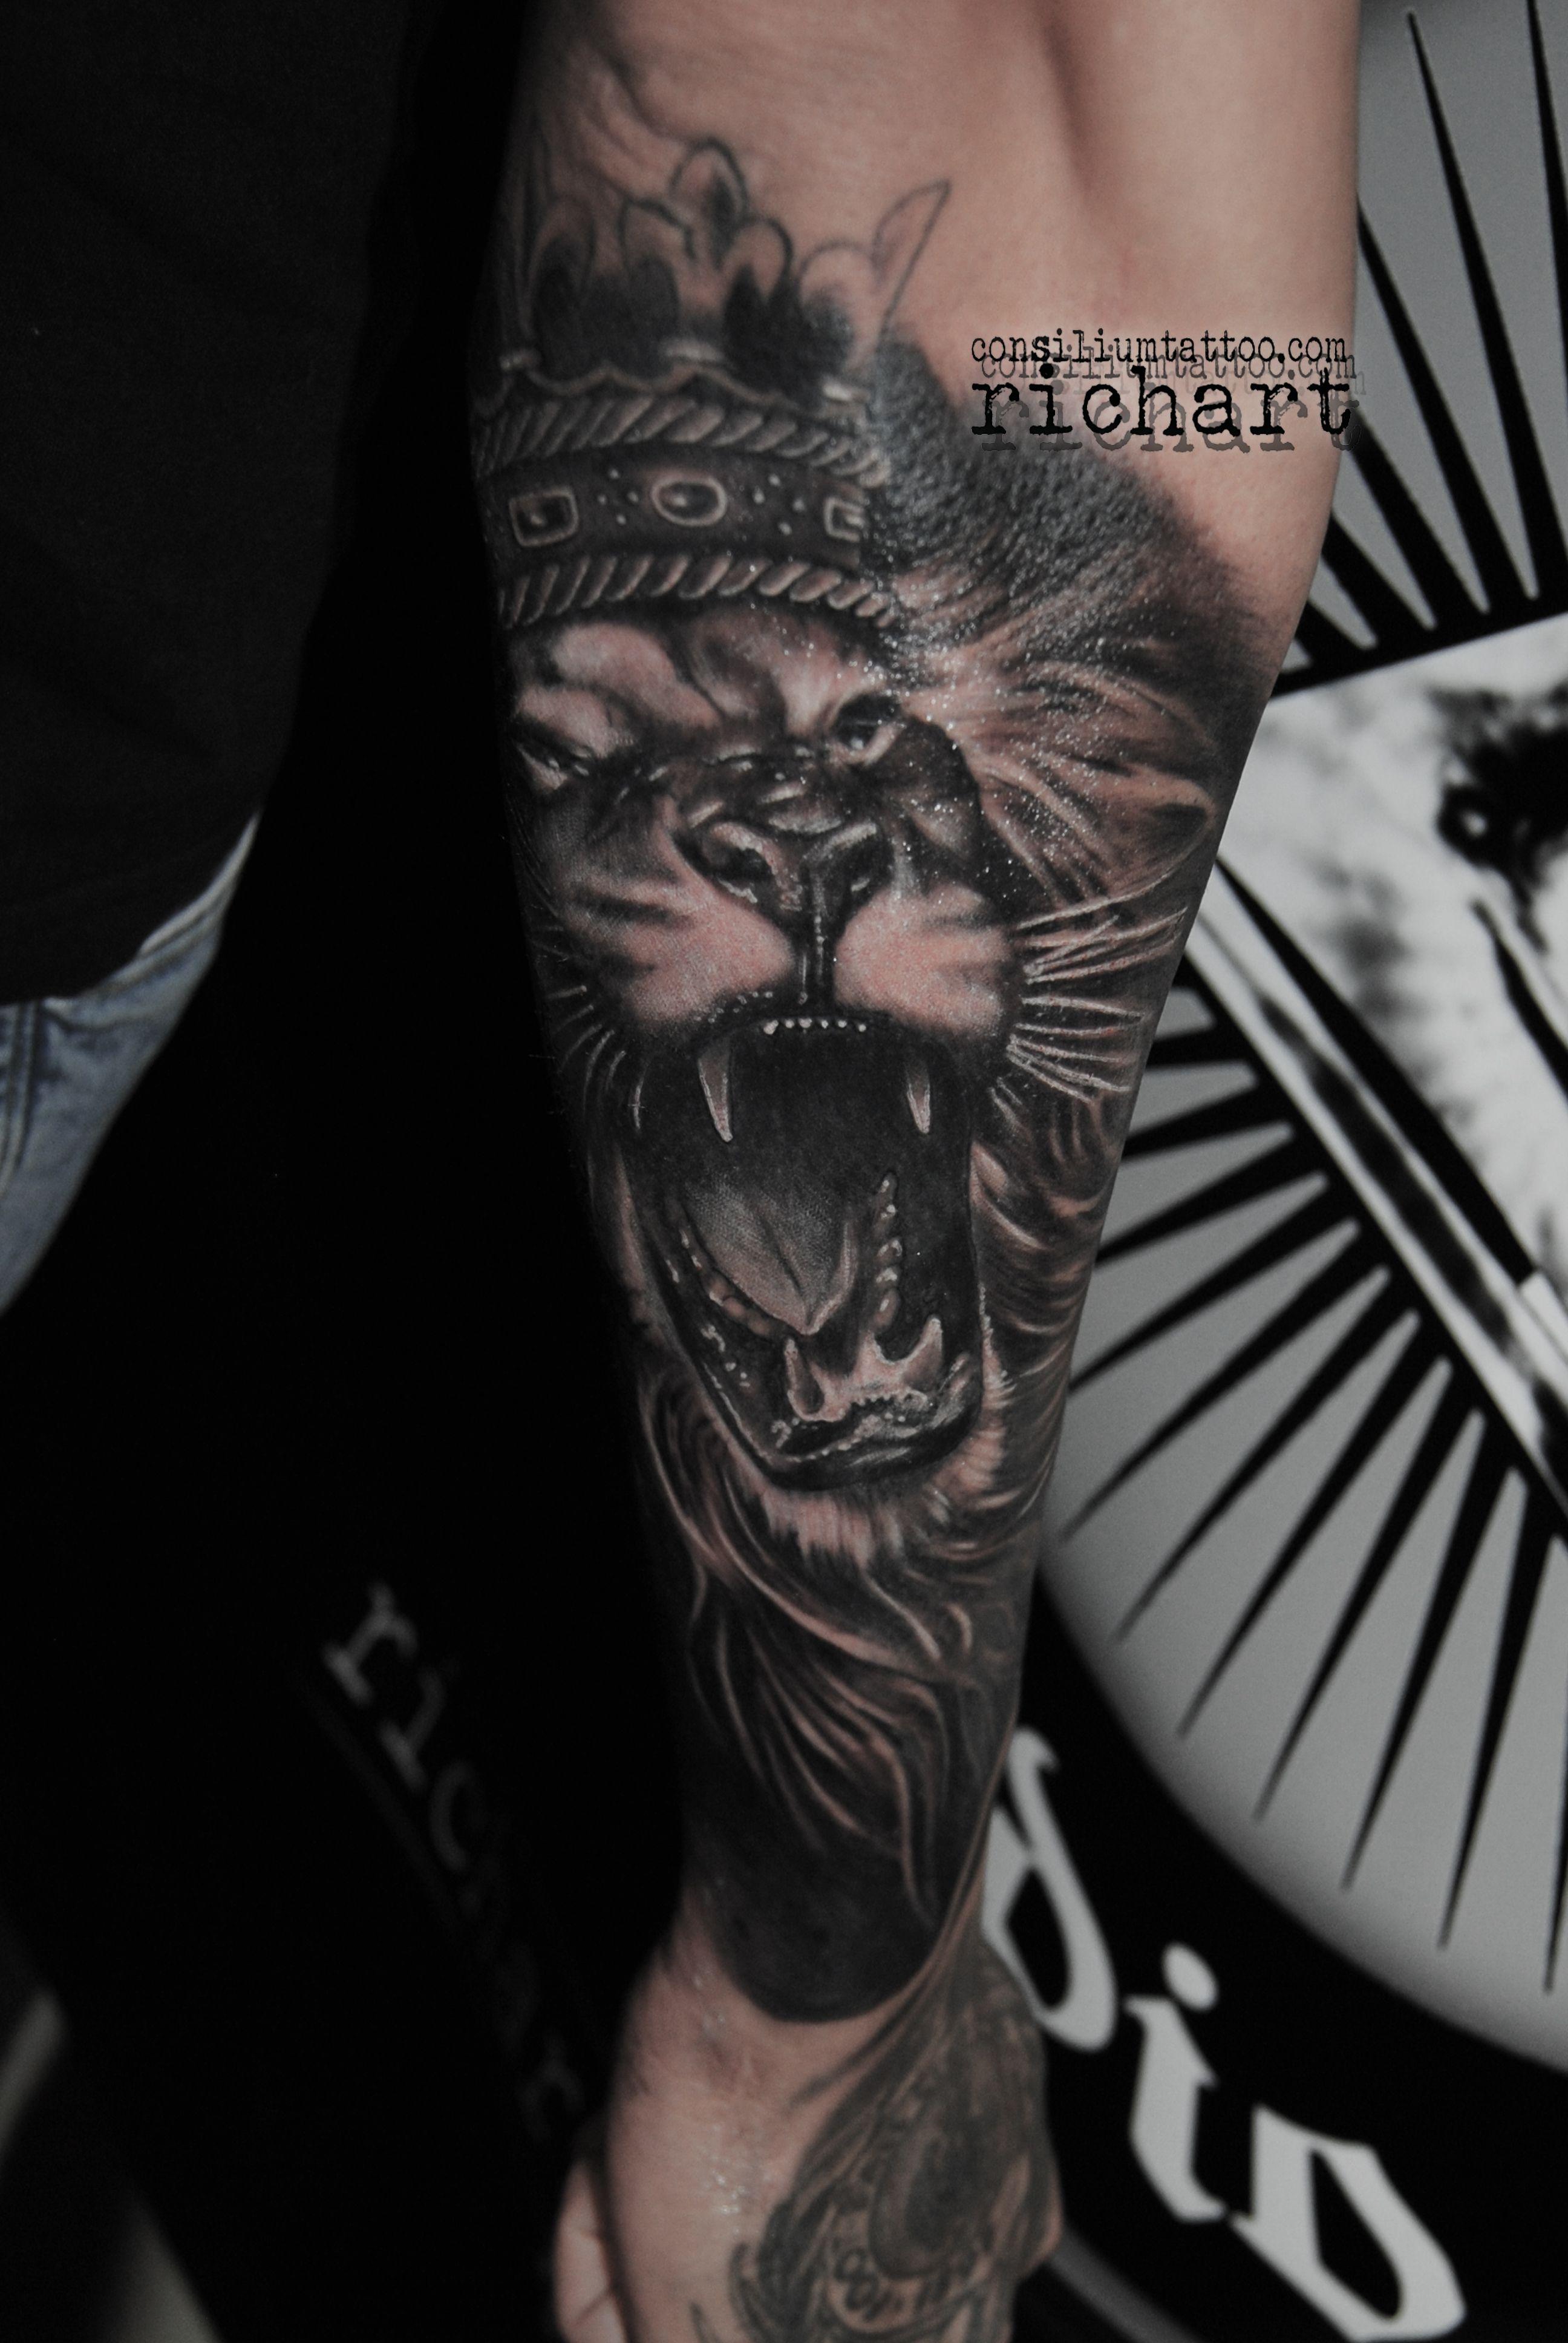 Tatuajes Tattoo Tatuaje Leon Consilium Tattoo Richart Moreno